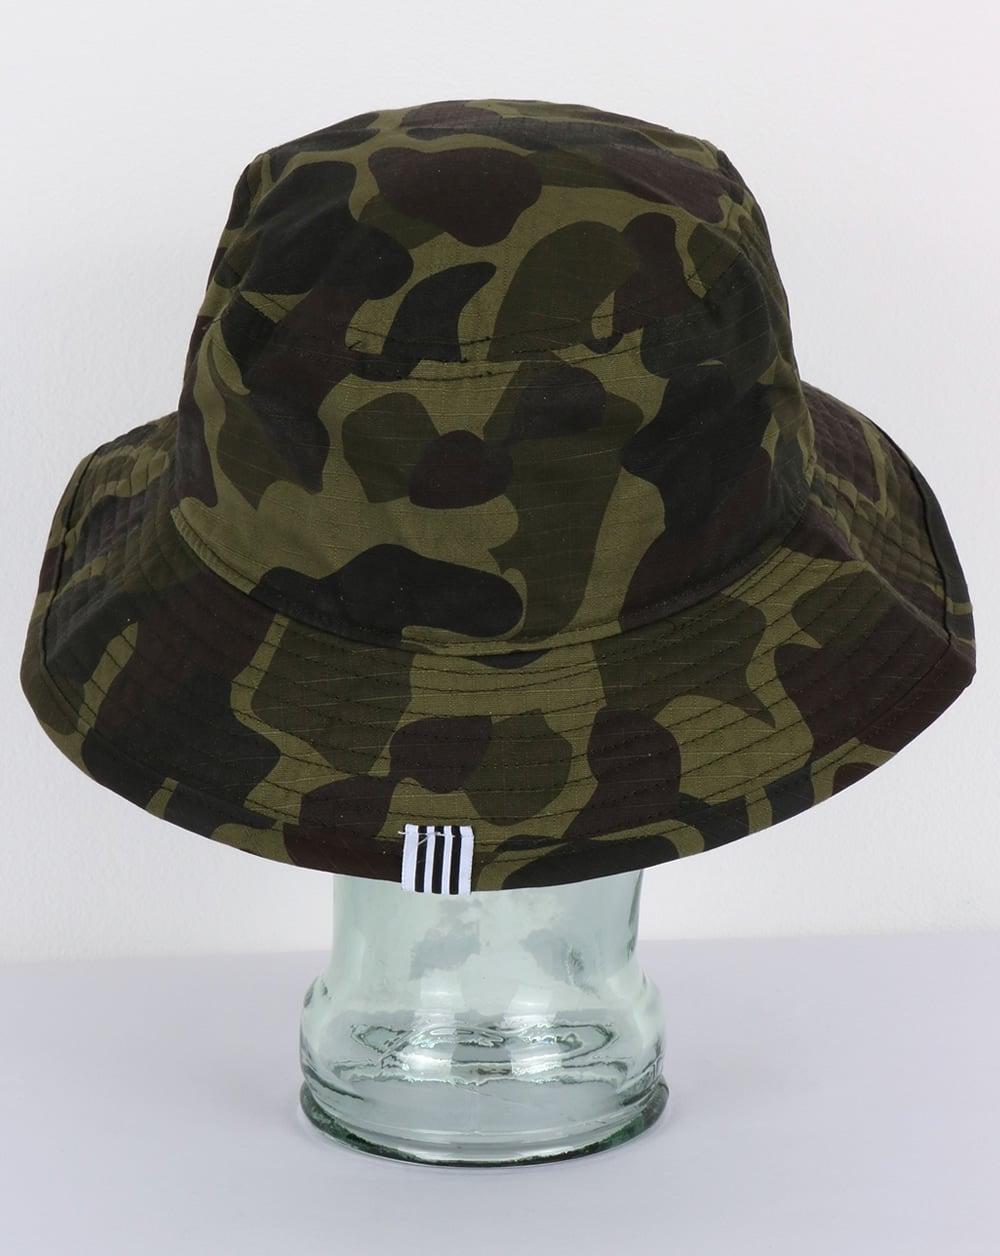 aafff3ca Adidas Originals Bucket Hat Camo,reni,80s,stone roses,festival